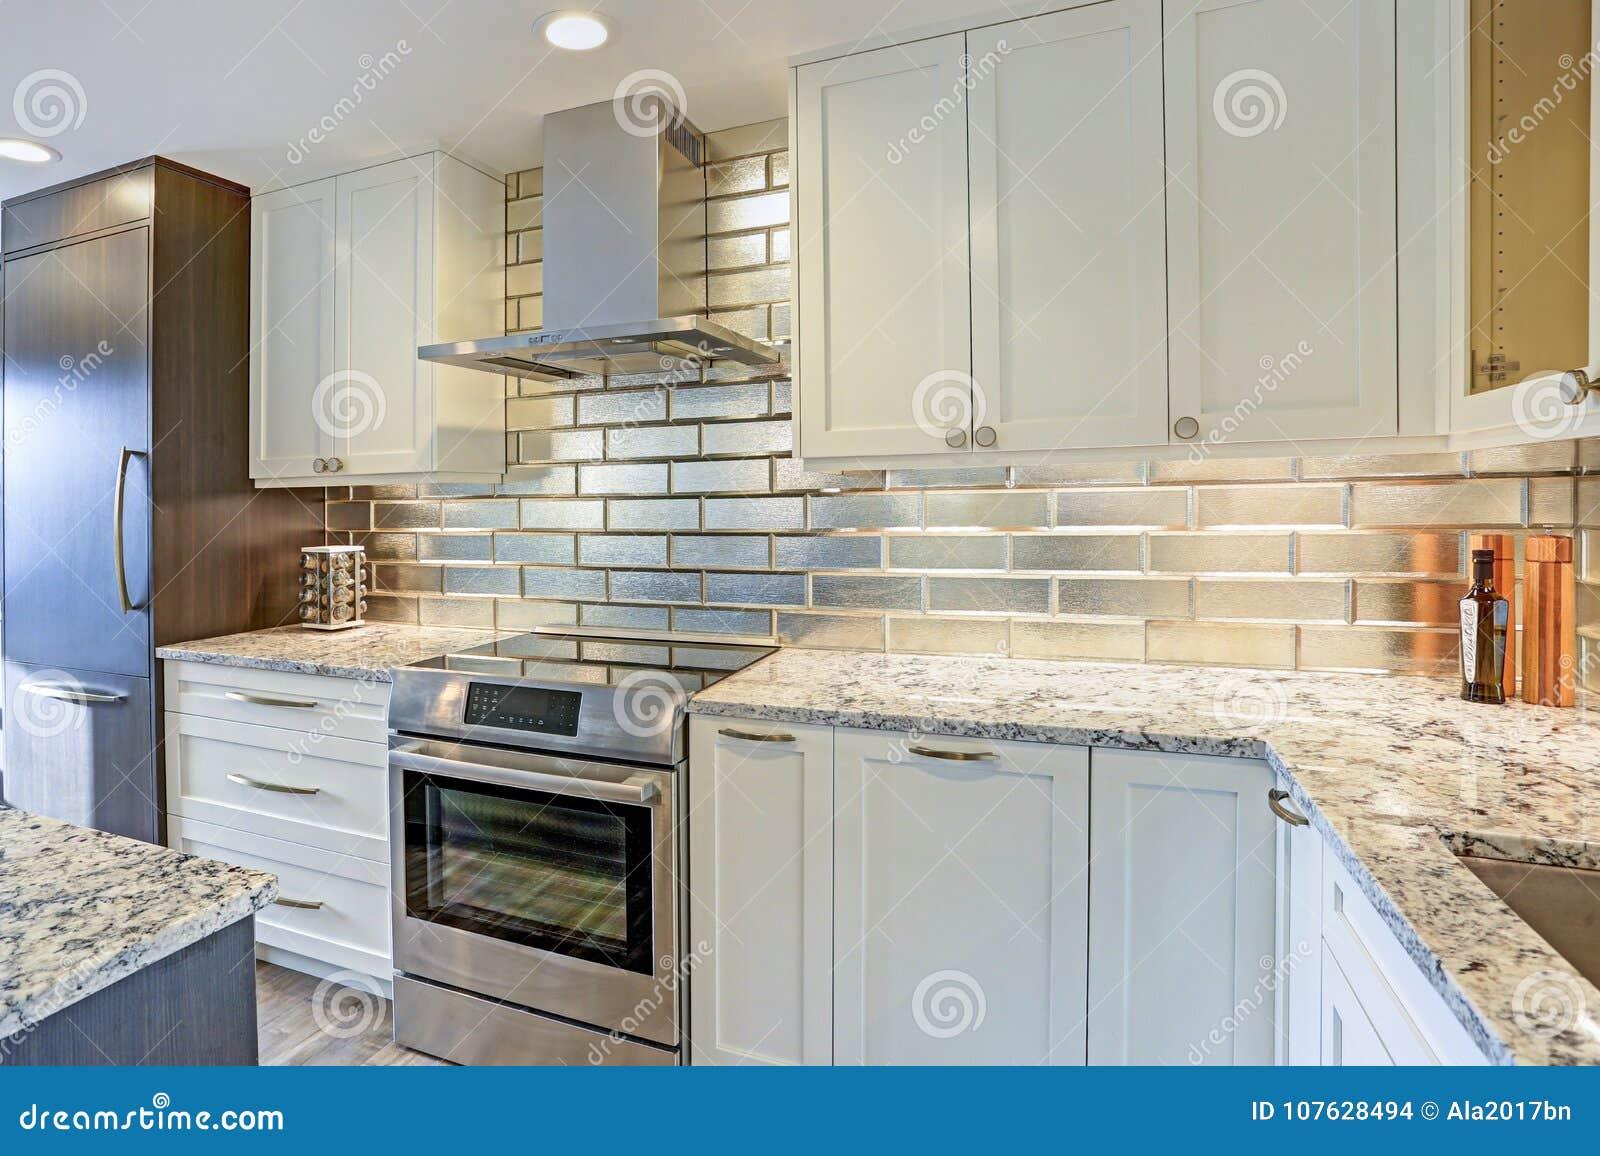 - Modern White Kitchen Design With Silver Backsplash Stock Photo